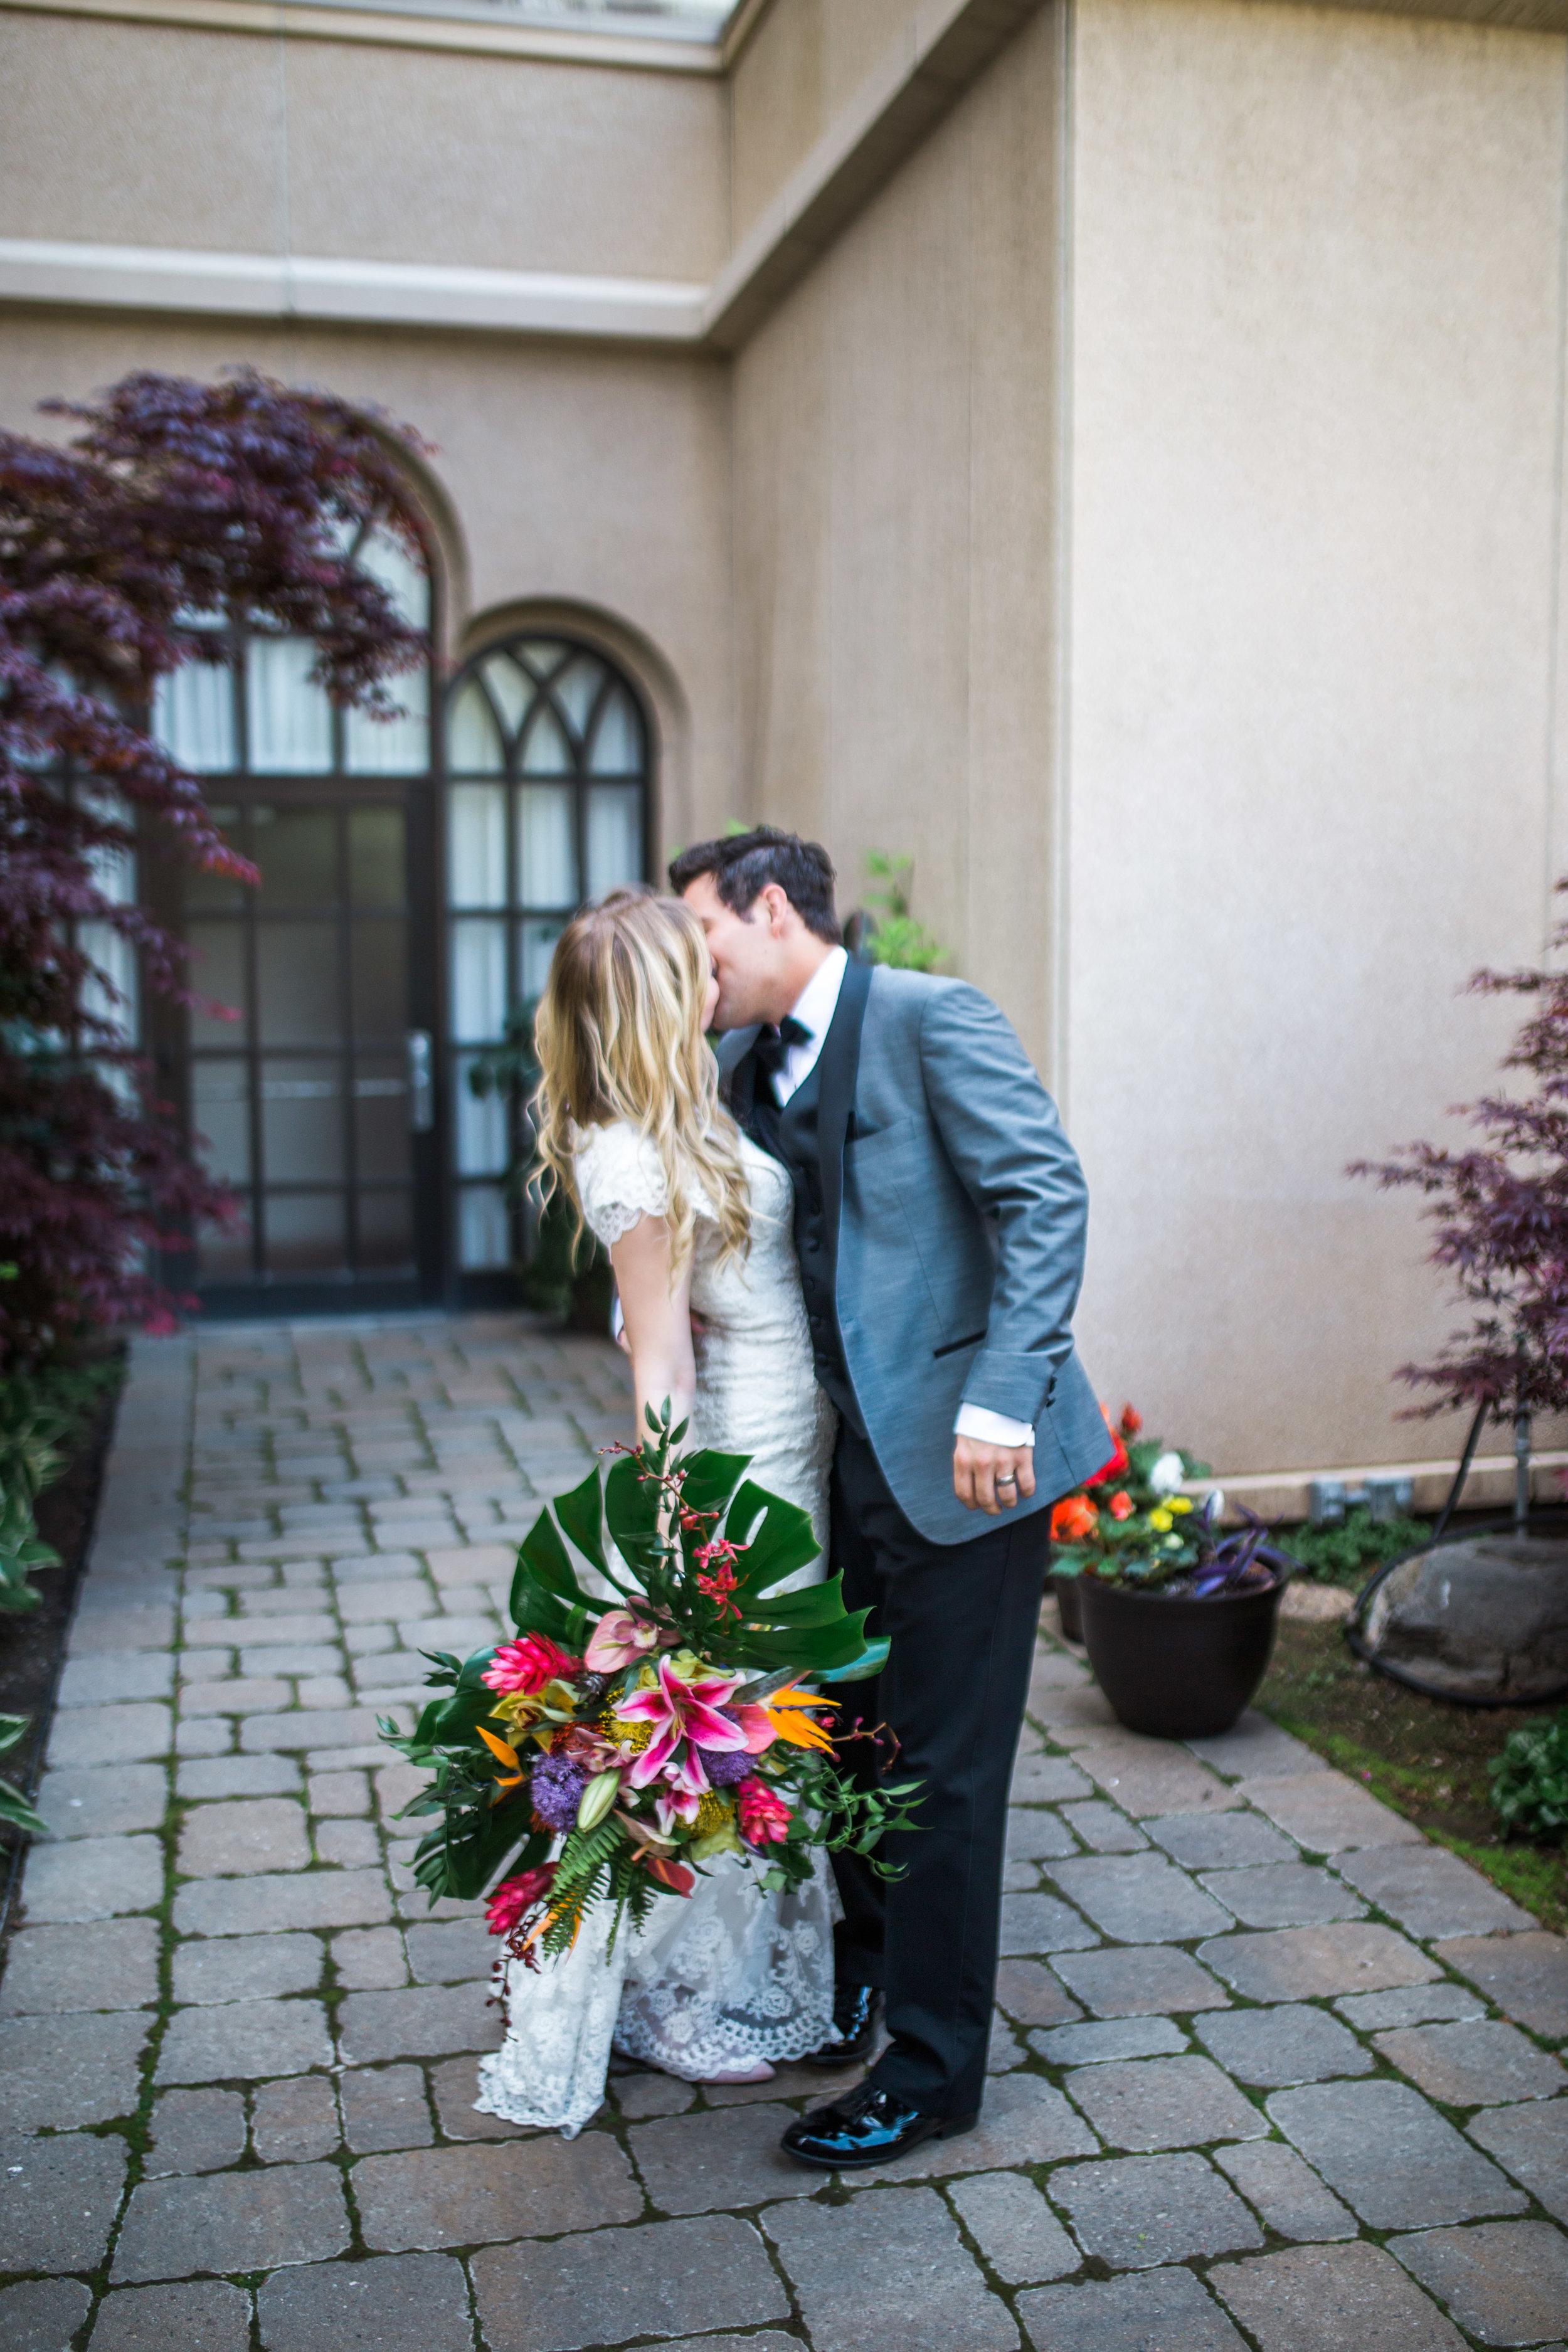 WeddingDaySealingandFamily (9 of 10).jpg